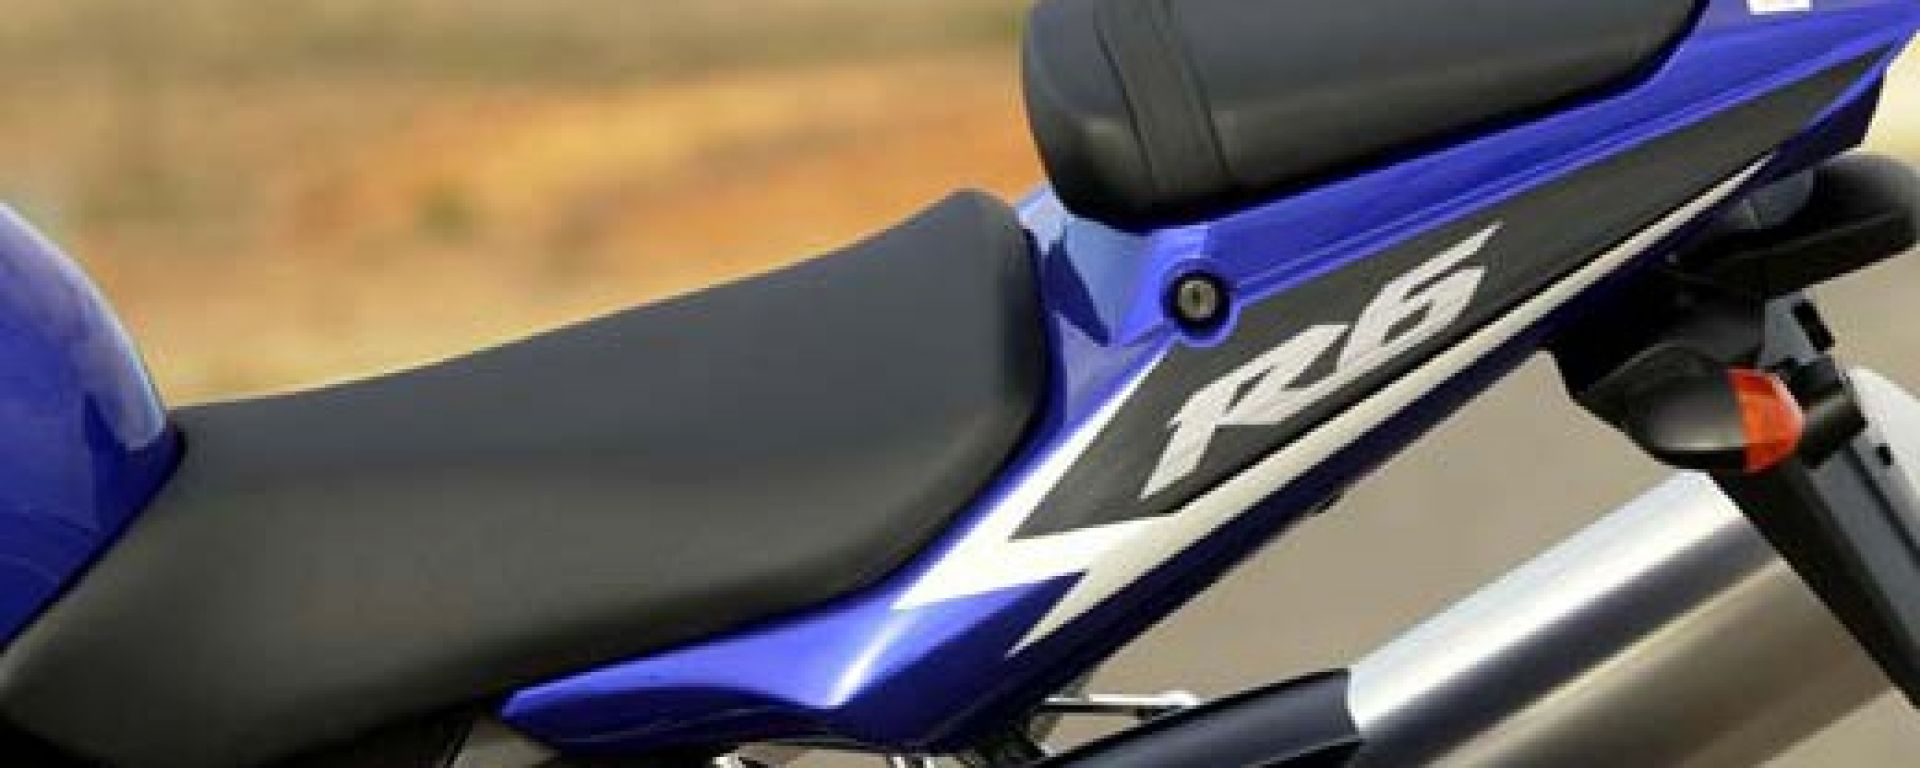 In sella alla Yamaha R6 '03